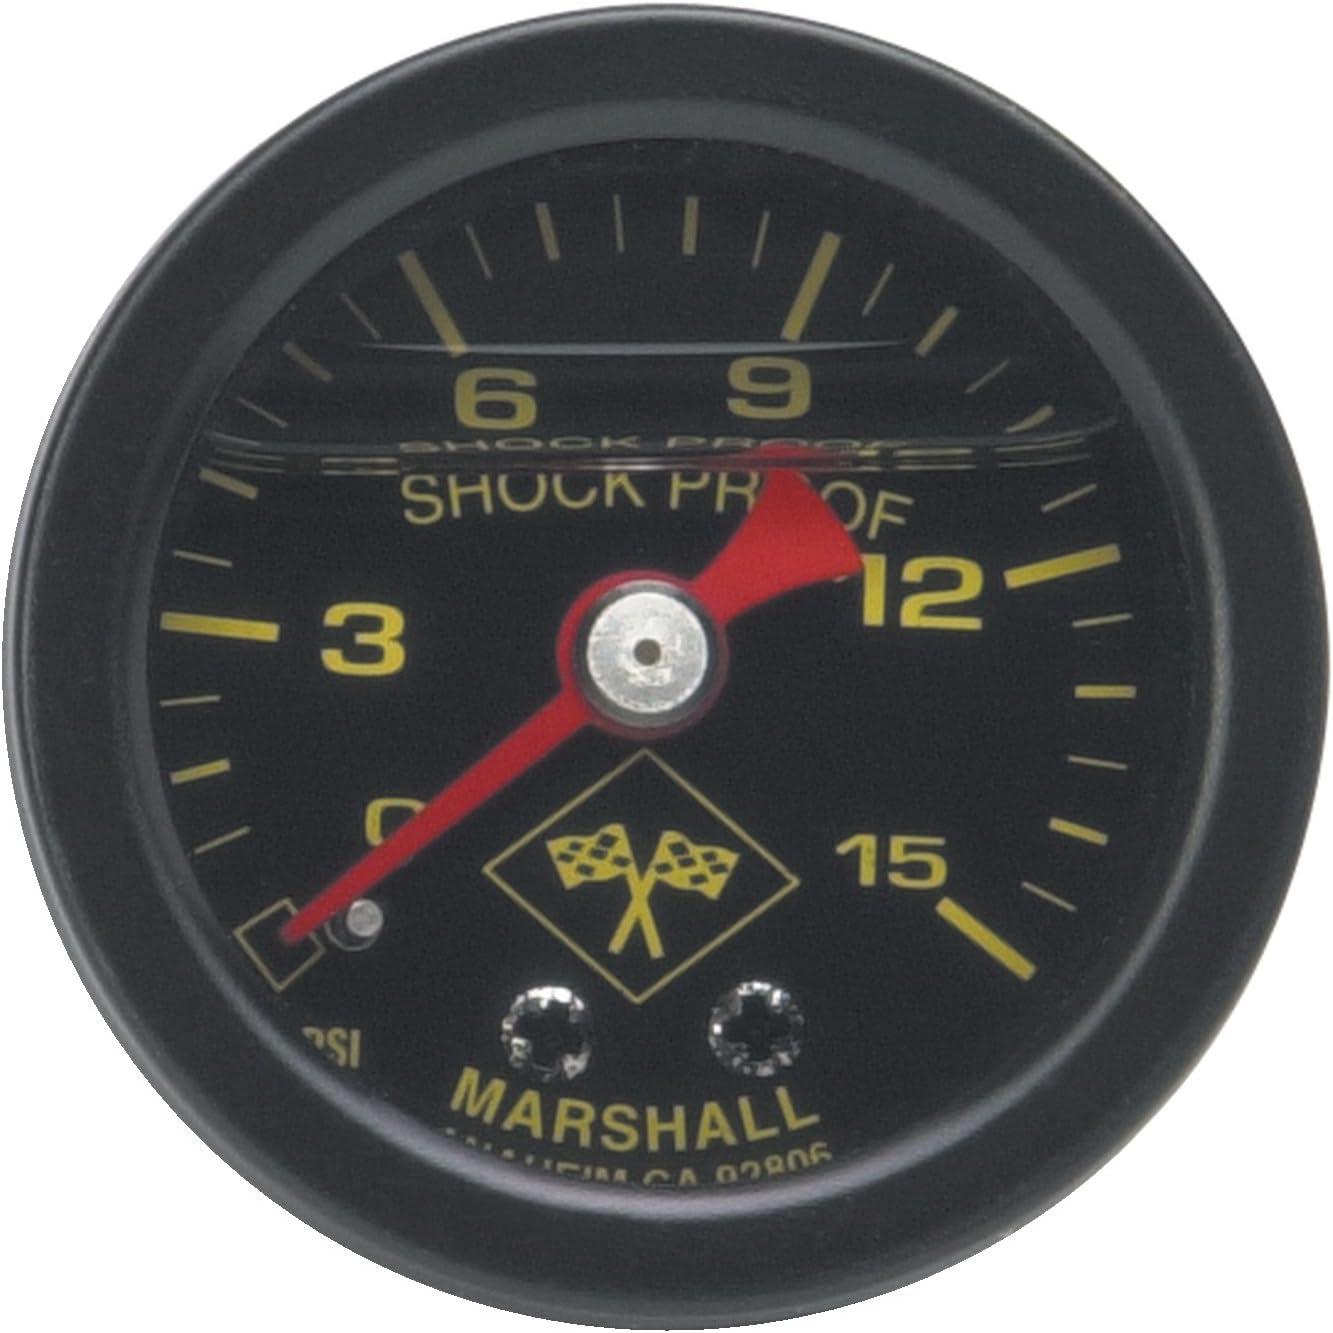 Edelbrock//Russell 650310 Fuel Pressure Gauge